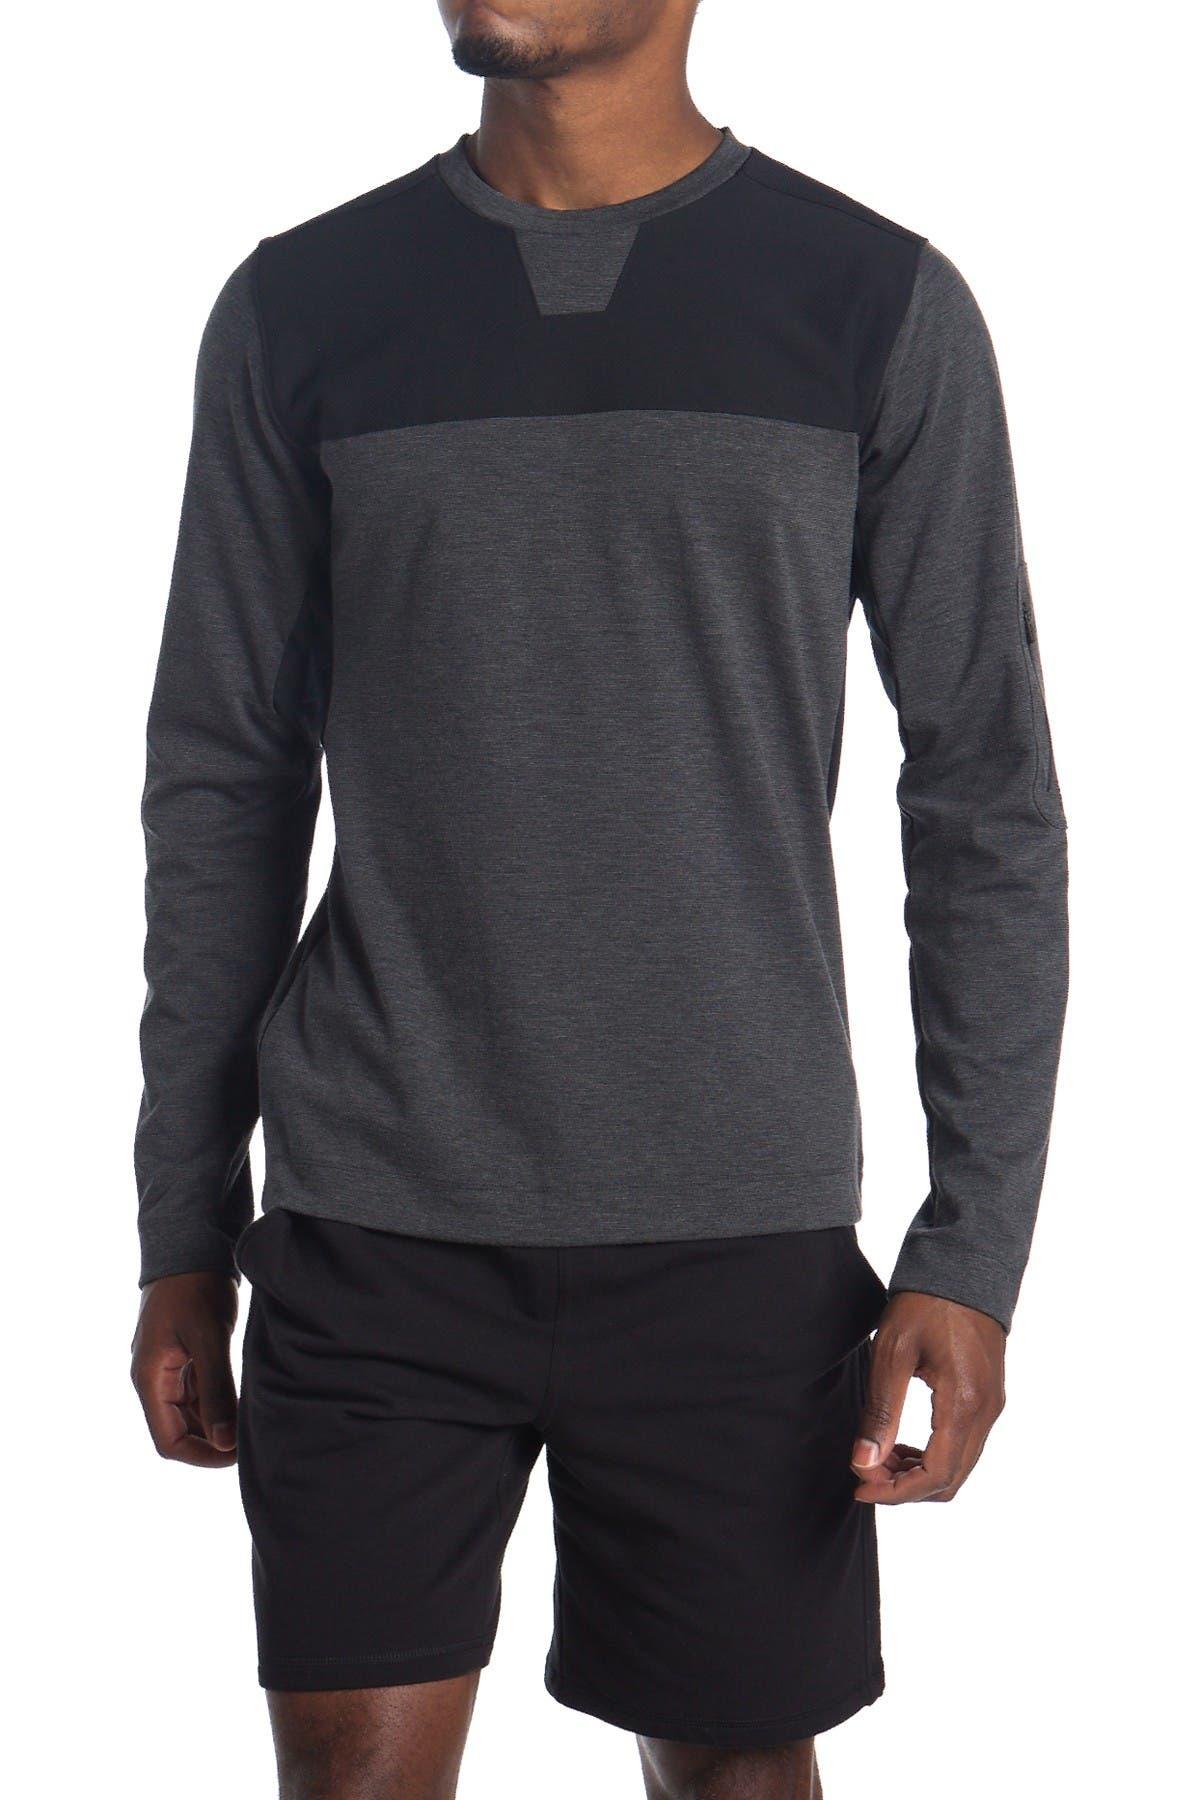 Image of New Balance Fortitech Crew Neck Sweatshirt